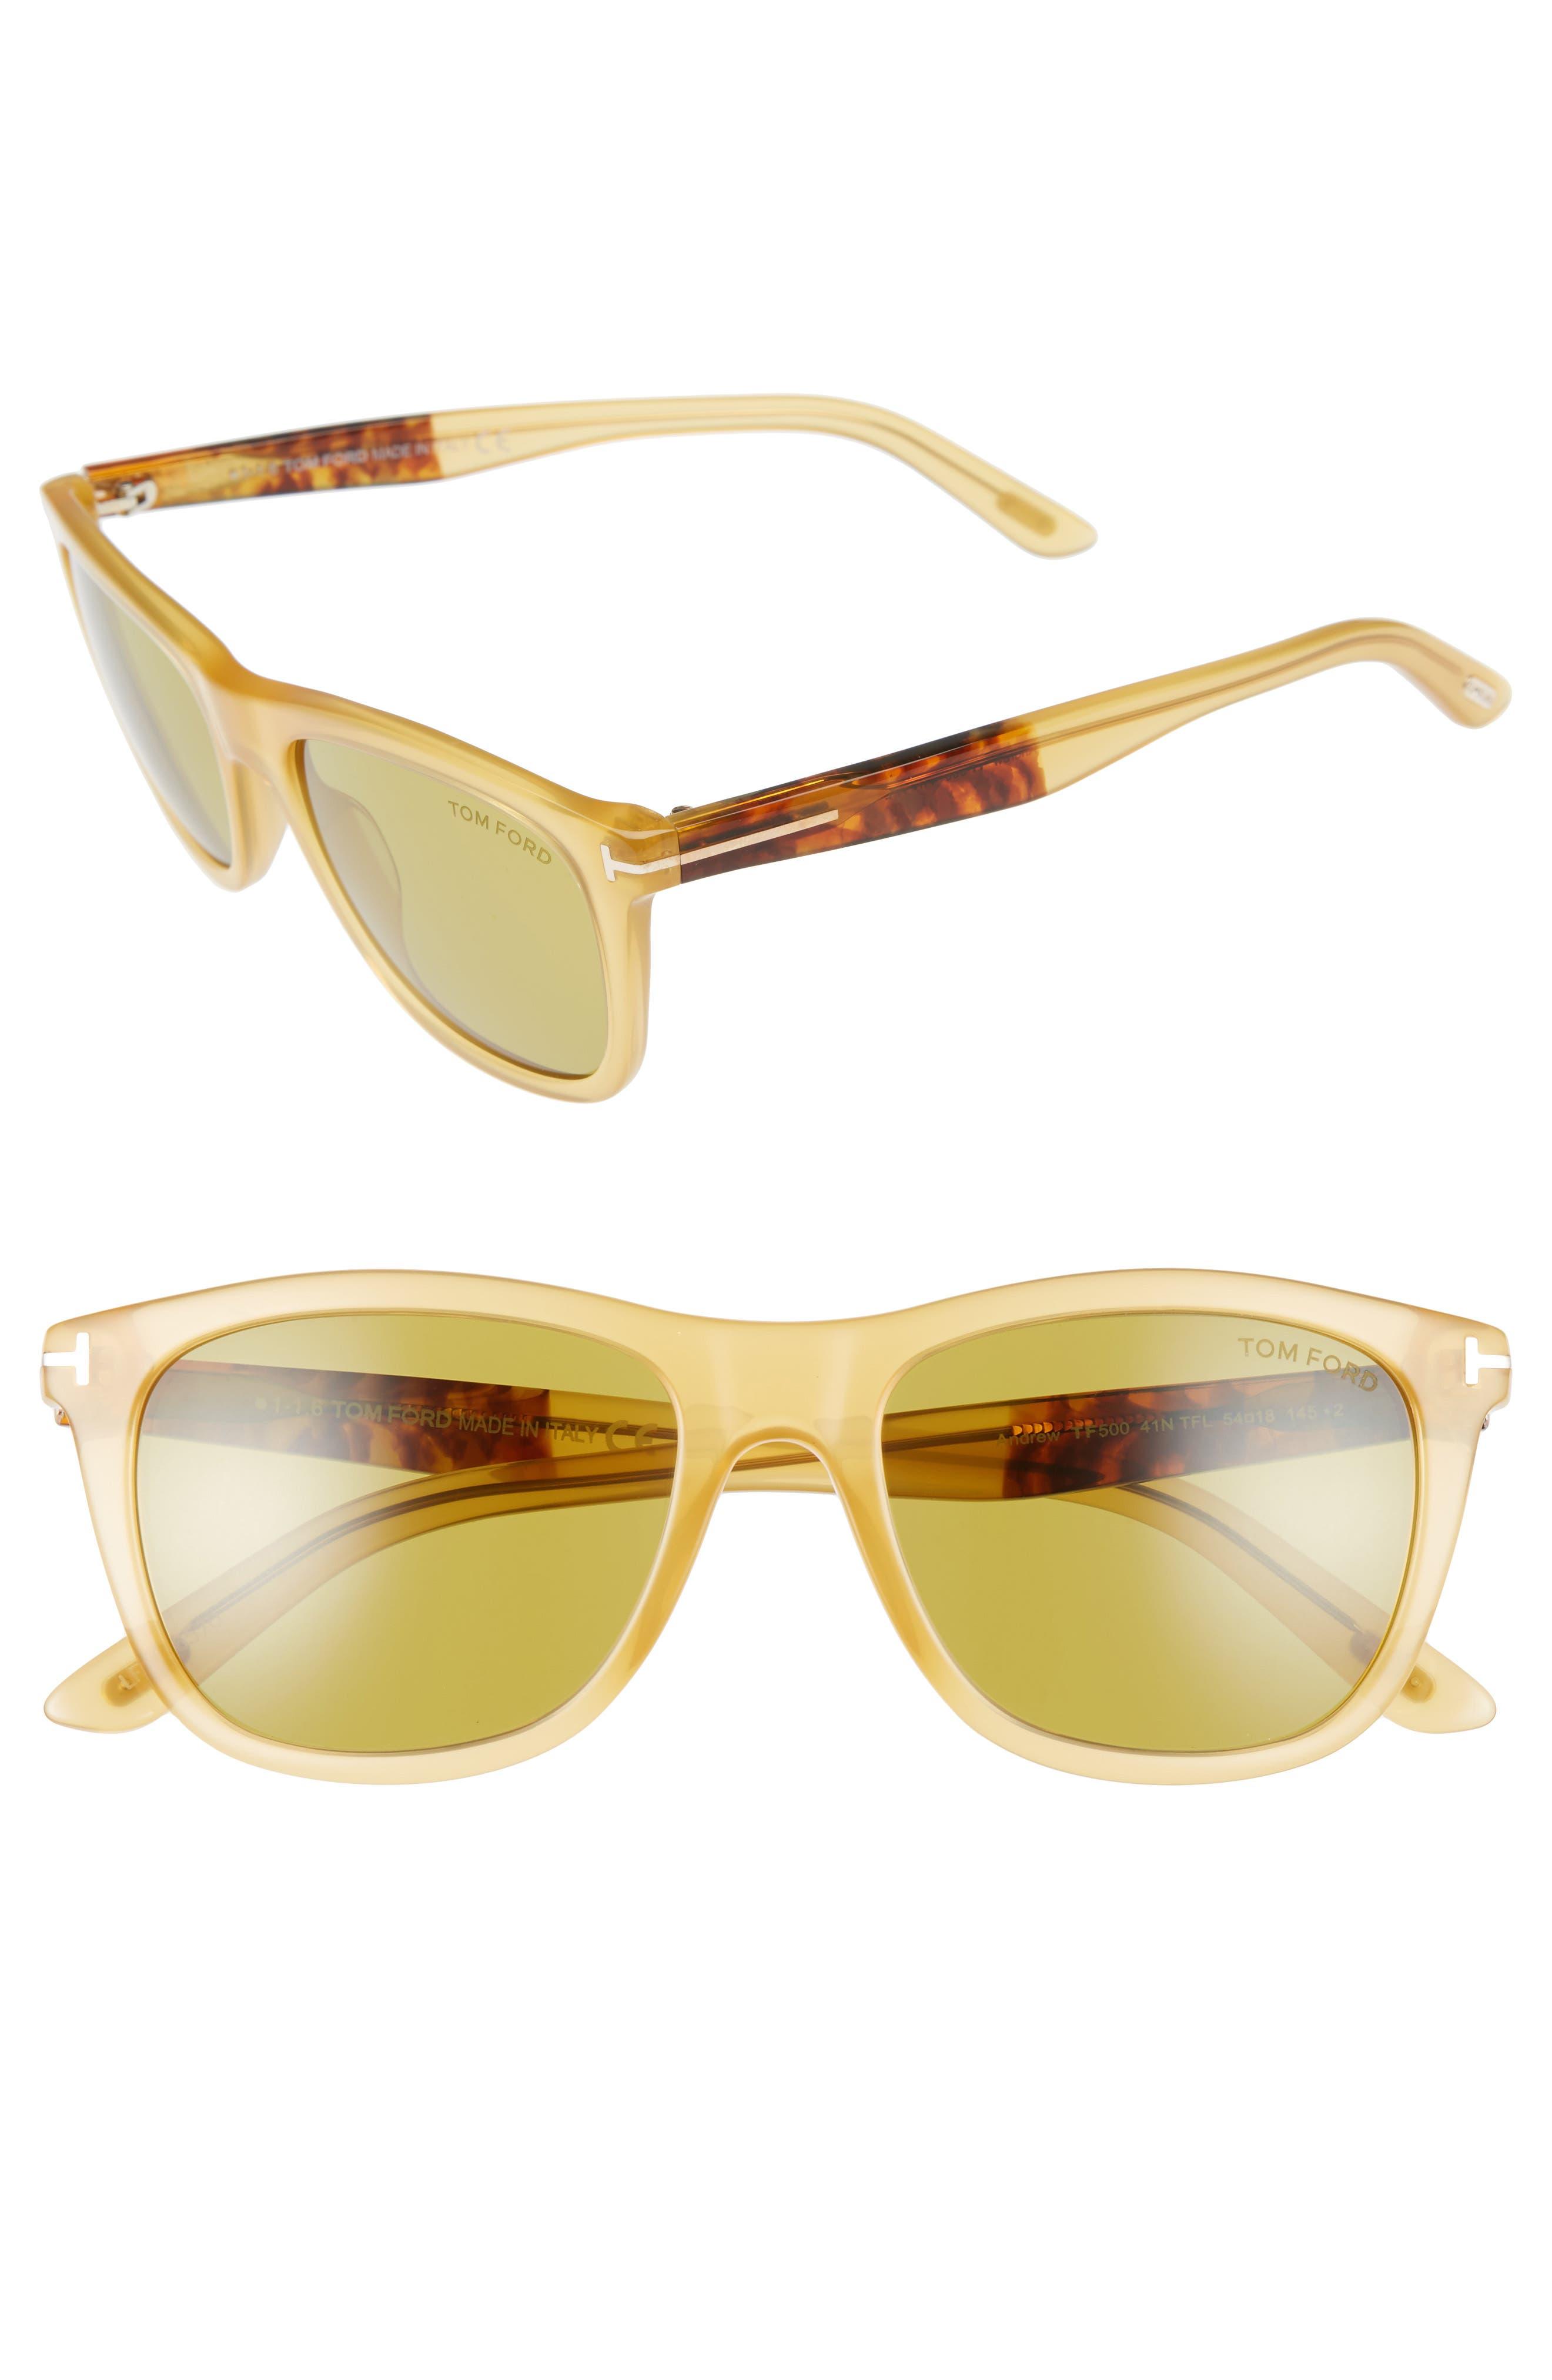 Andrew 54mm Sunglasses,                             Main thumbnail 1, color,                             250